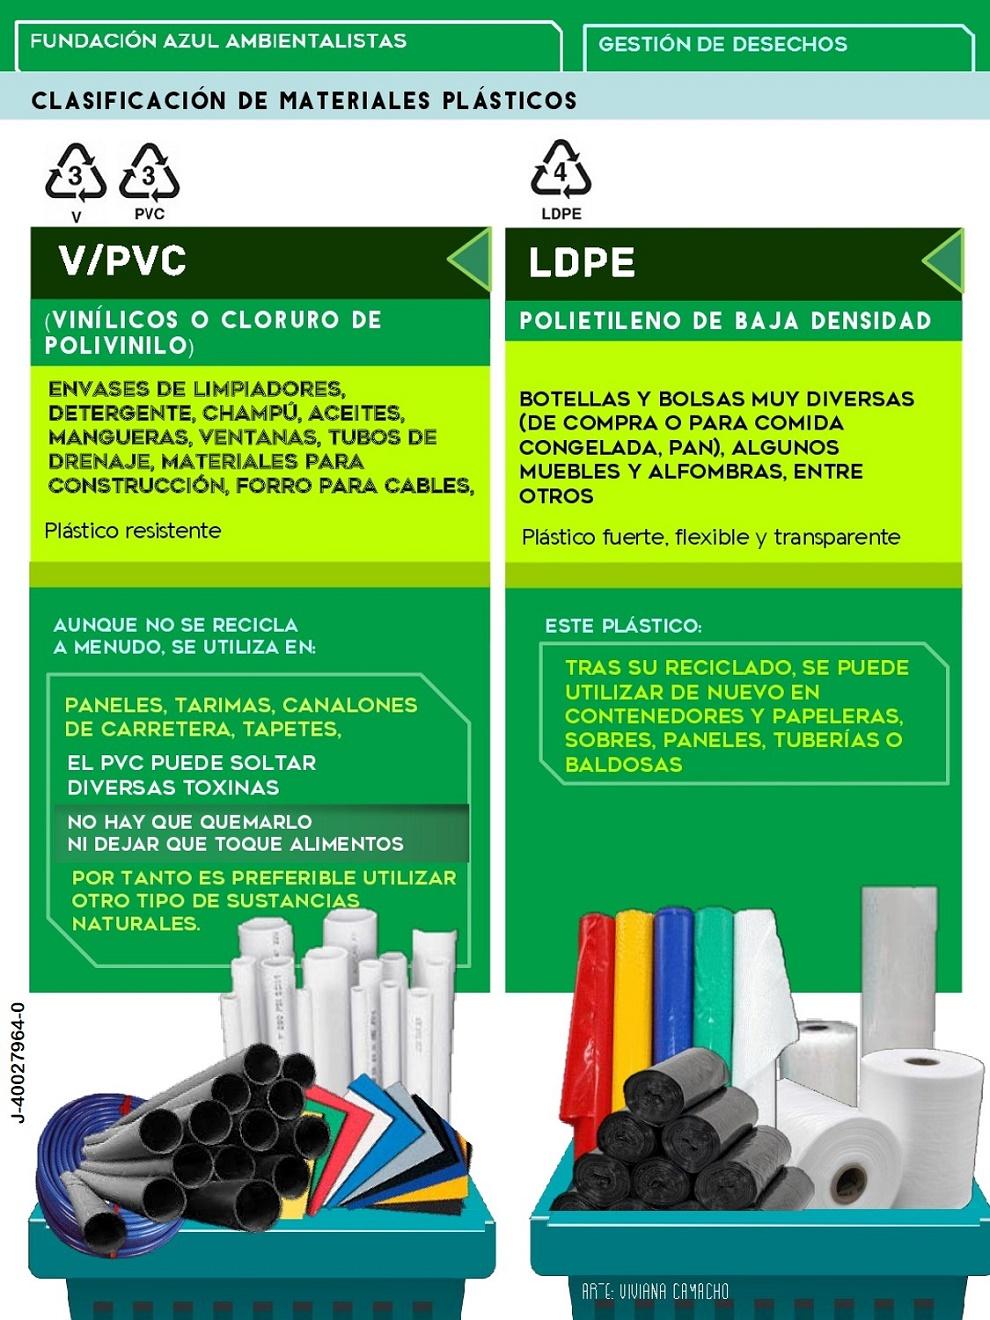 Cartilla-del-Plastico-002